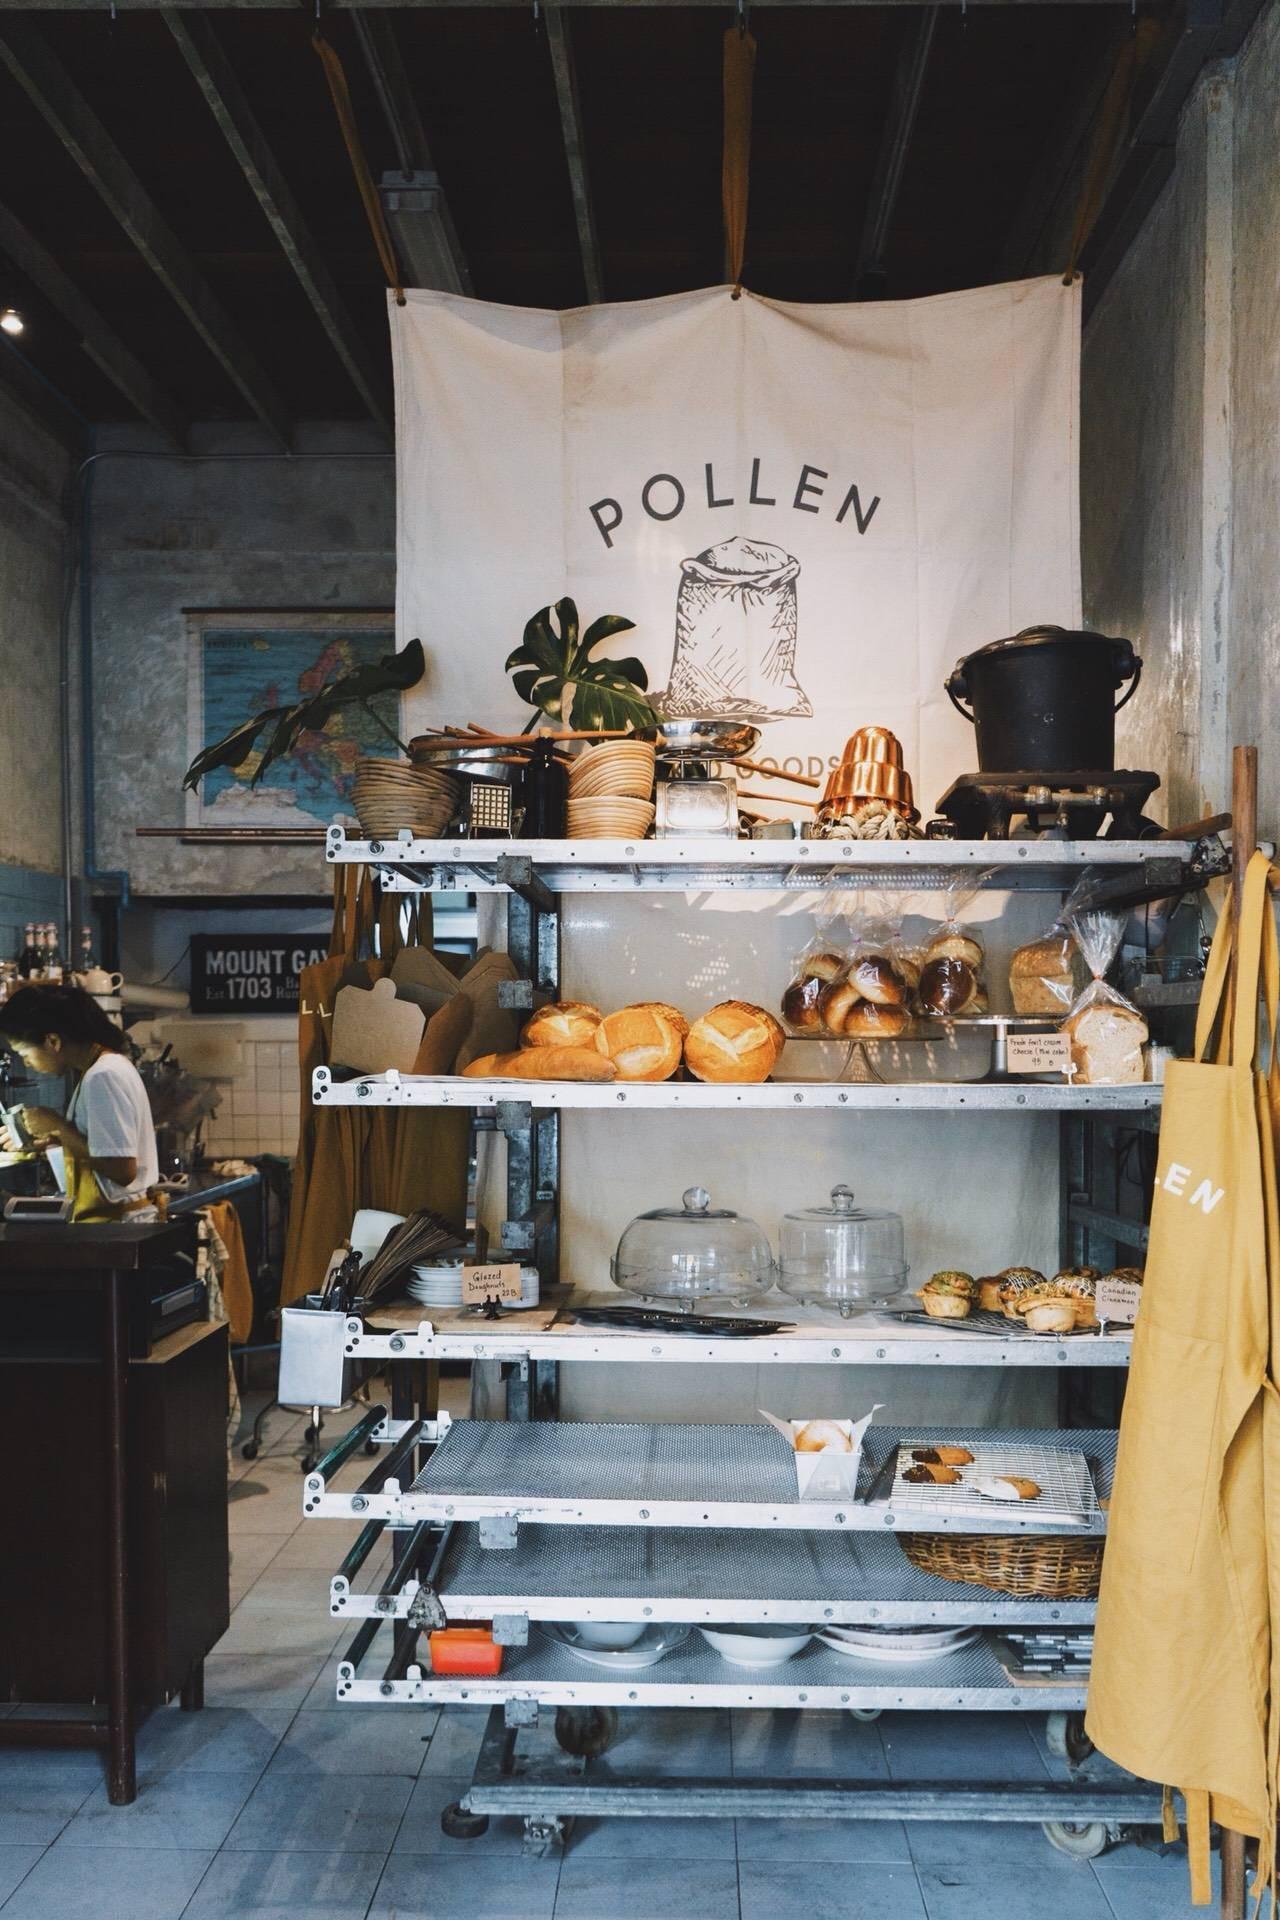 Pollen Baked Goods